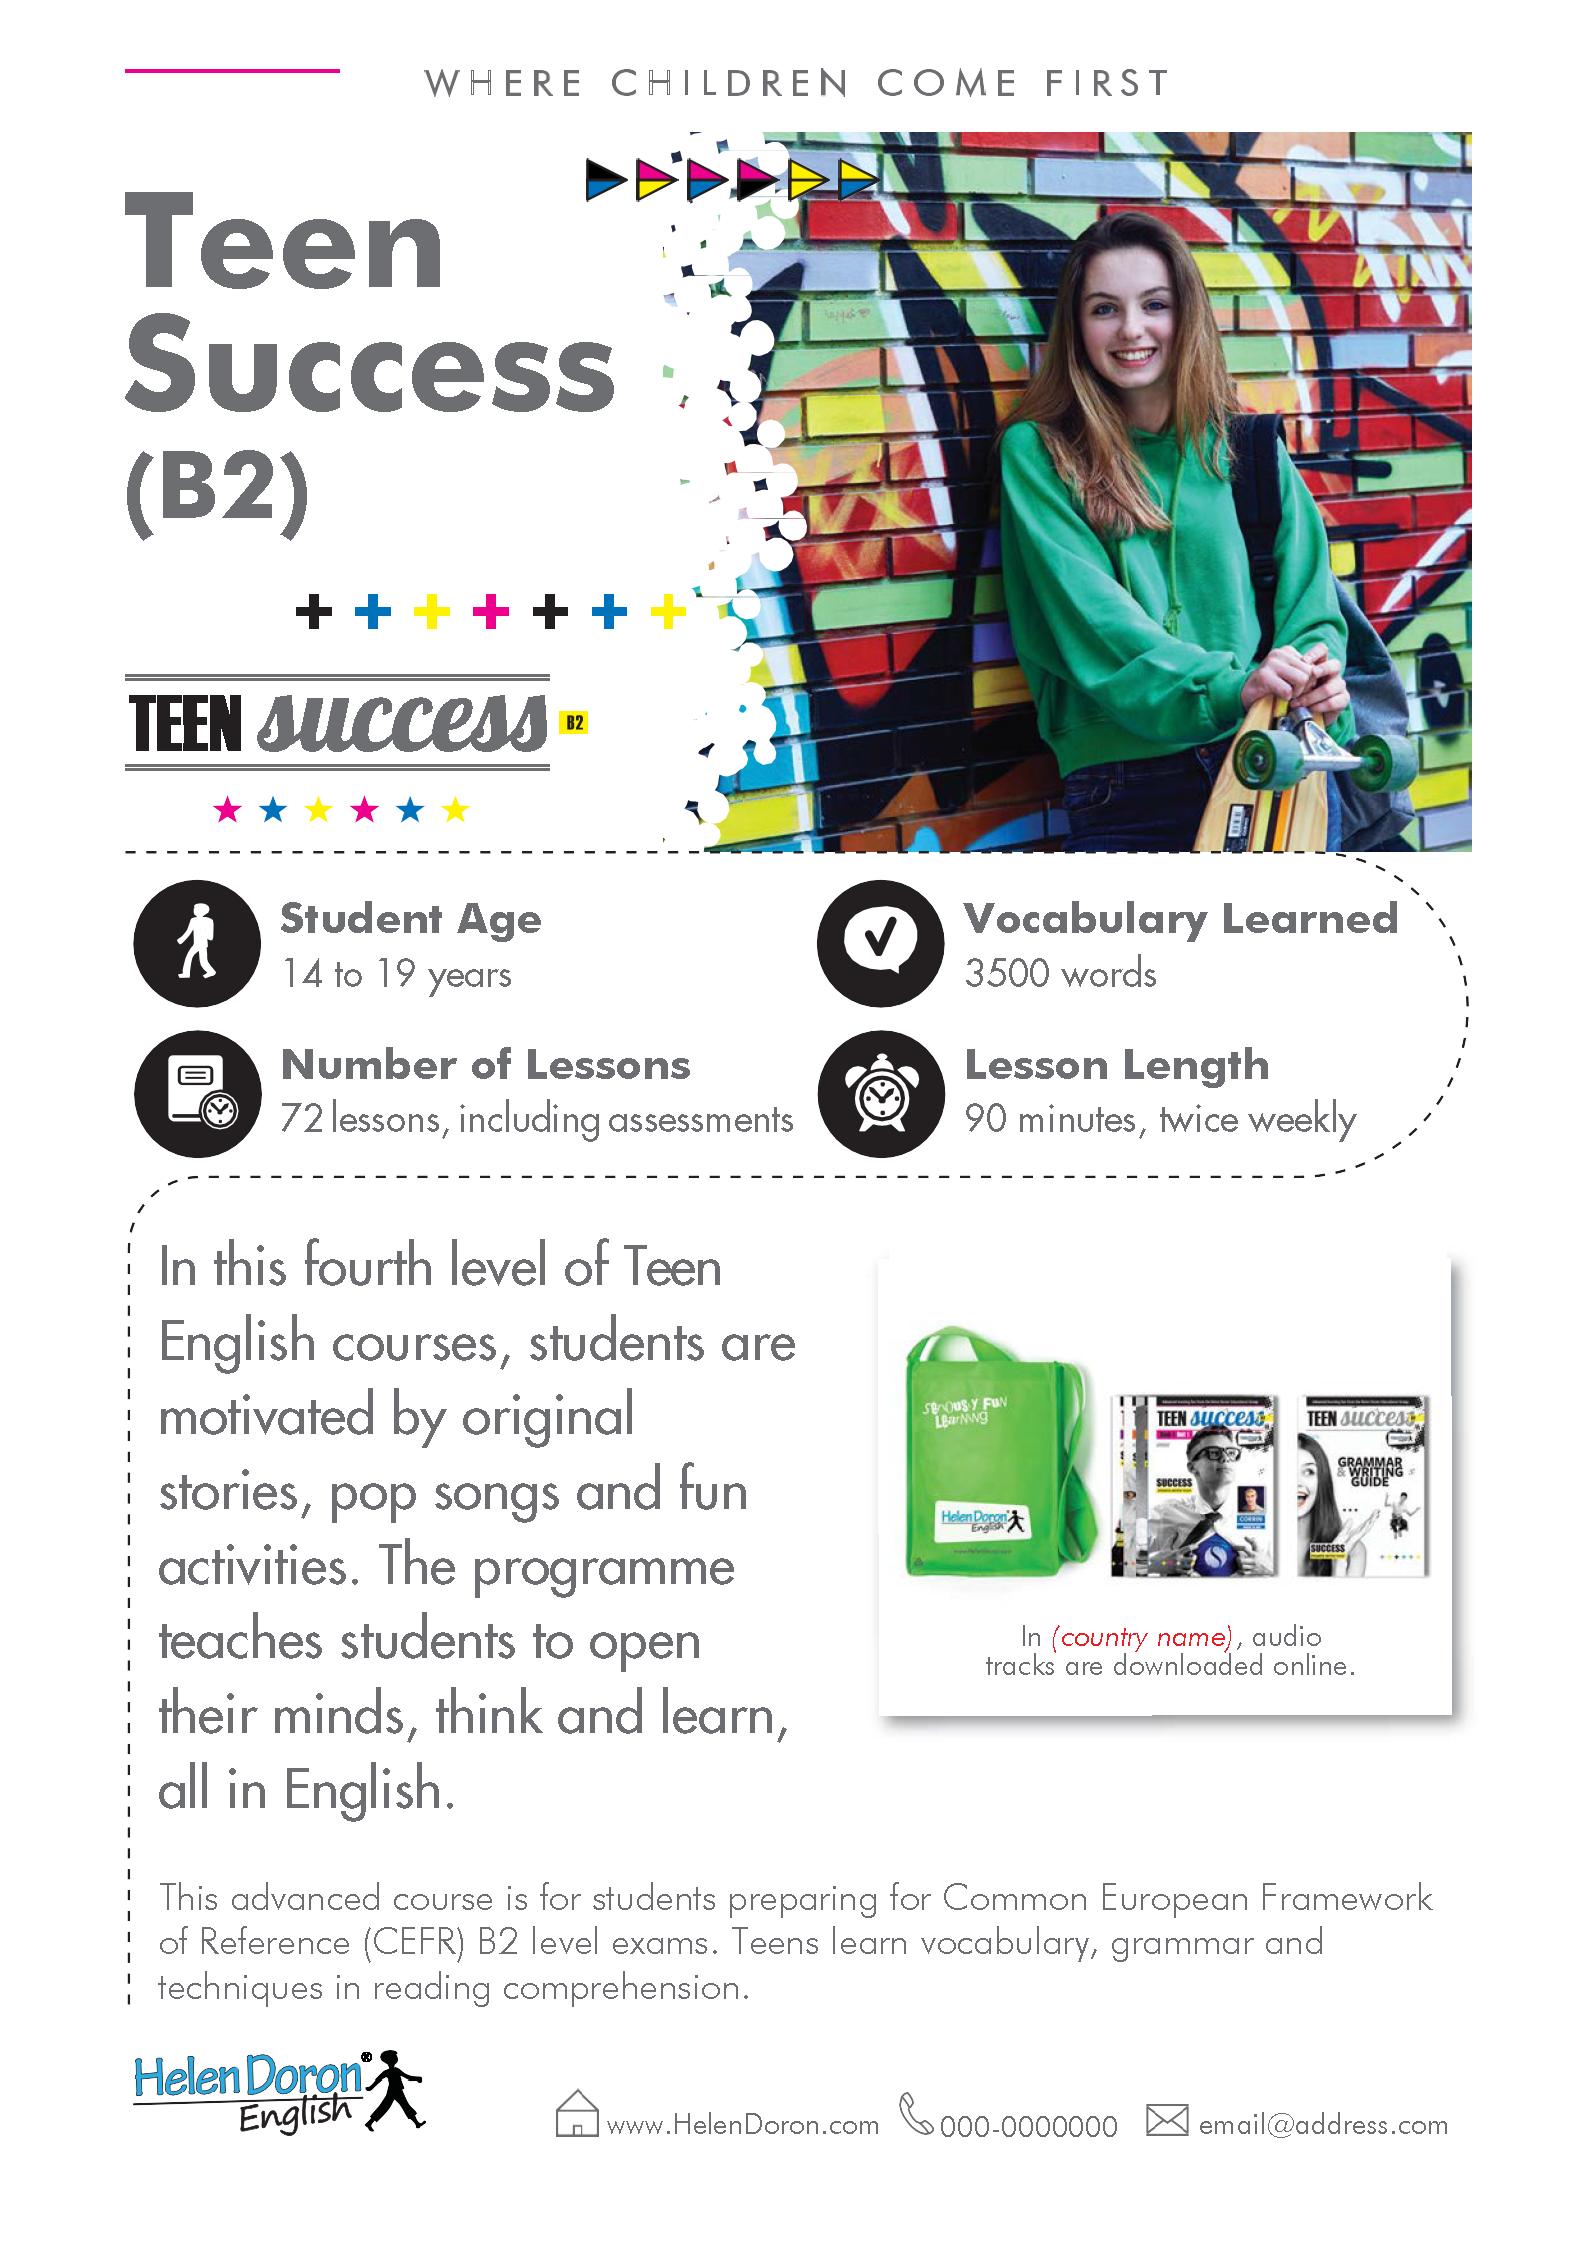 Download - Teen Success (B2)